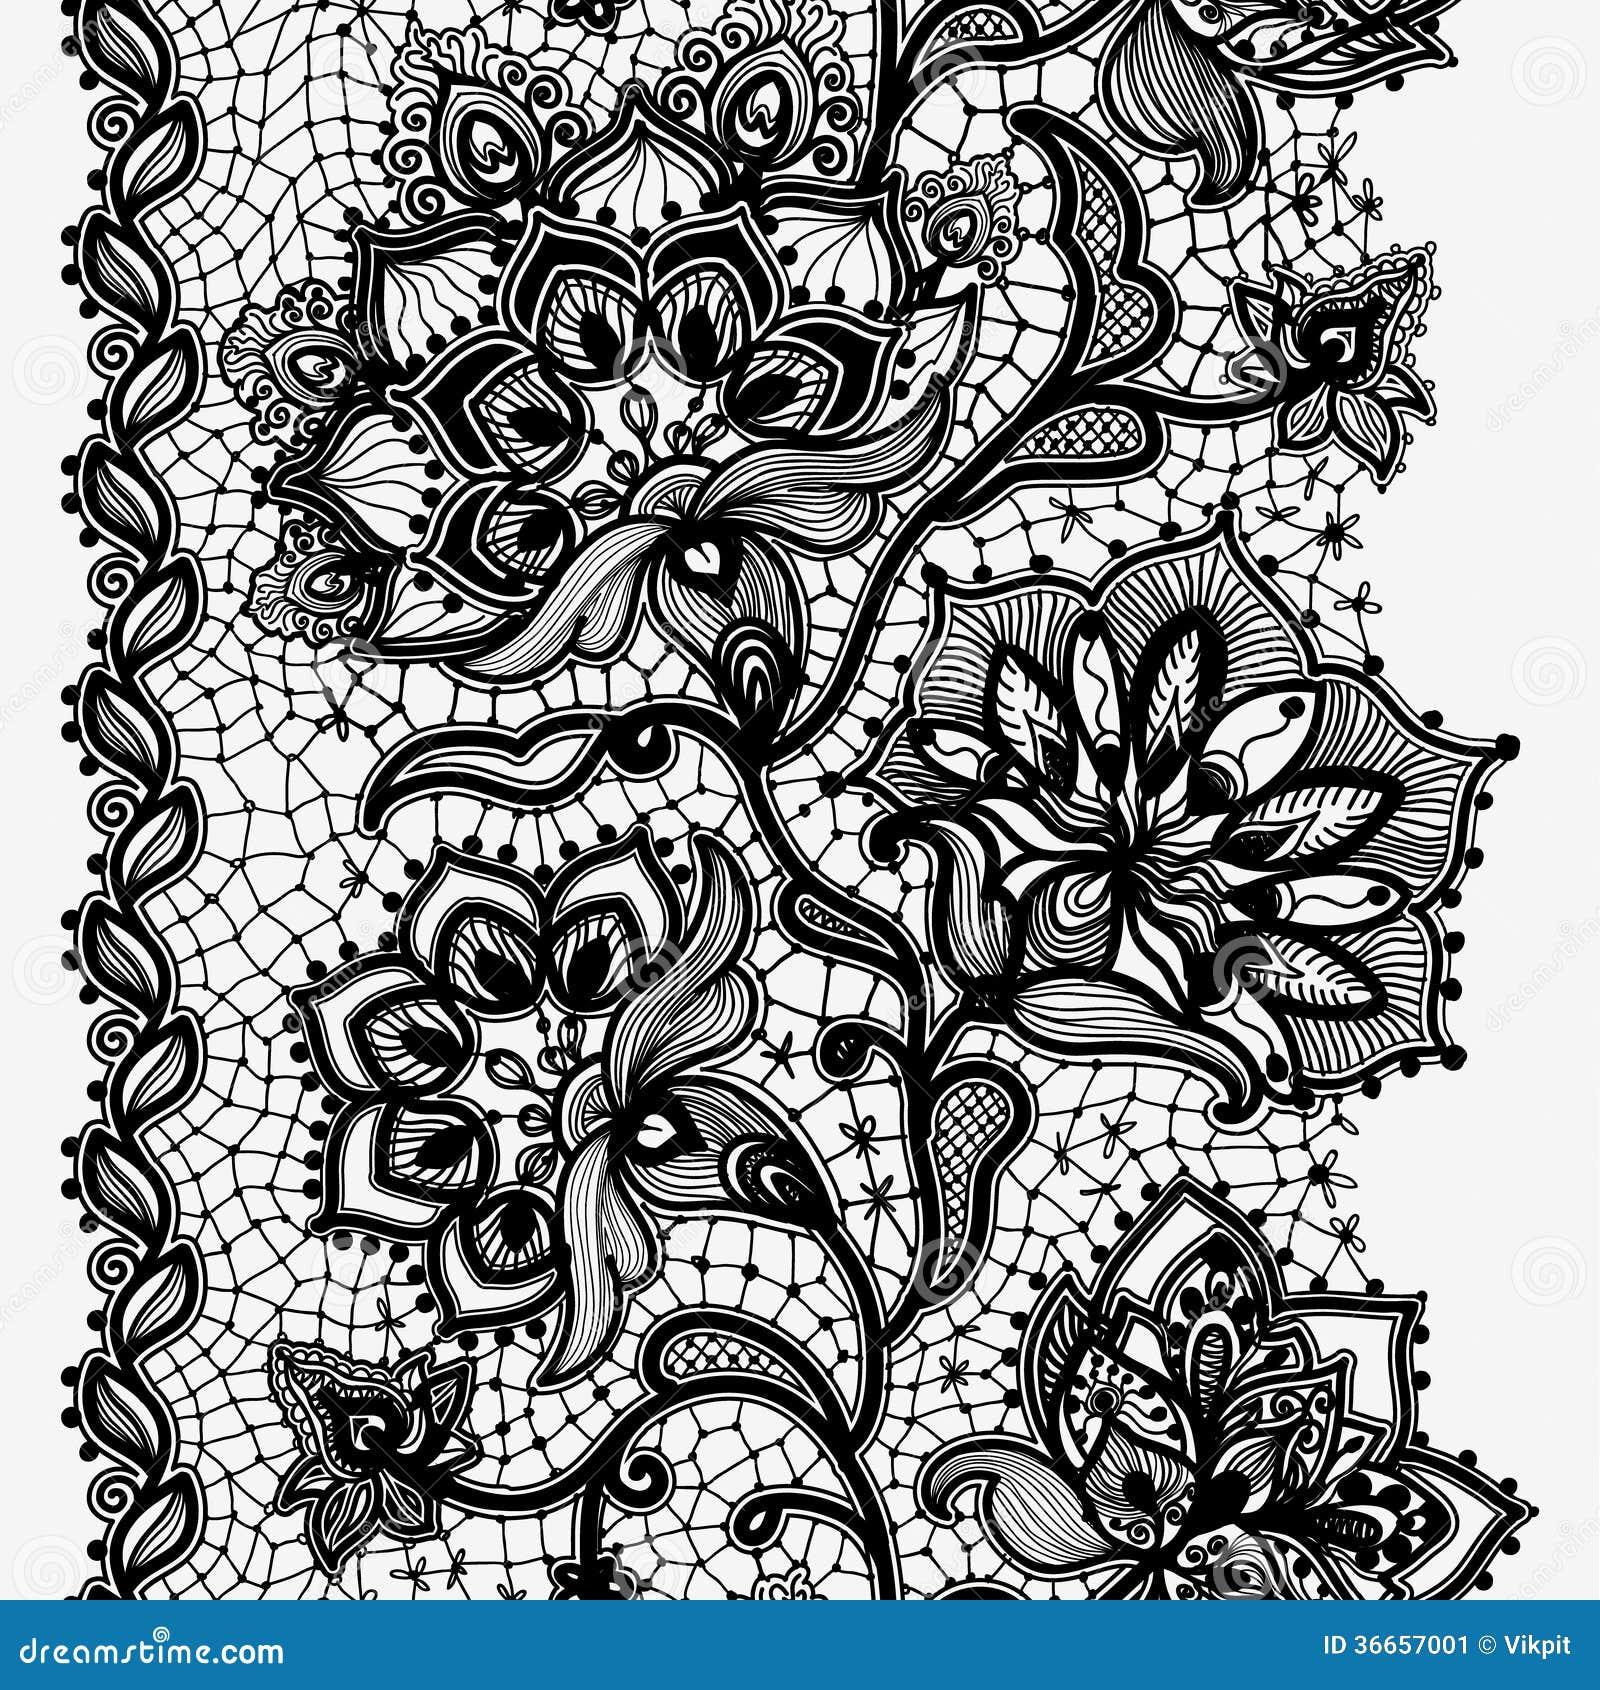 Abstract Kantlint